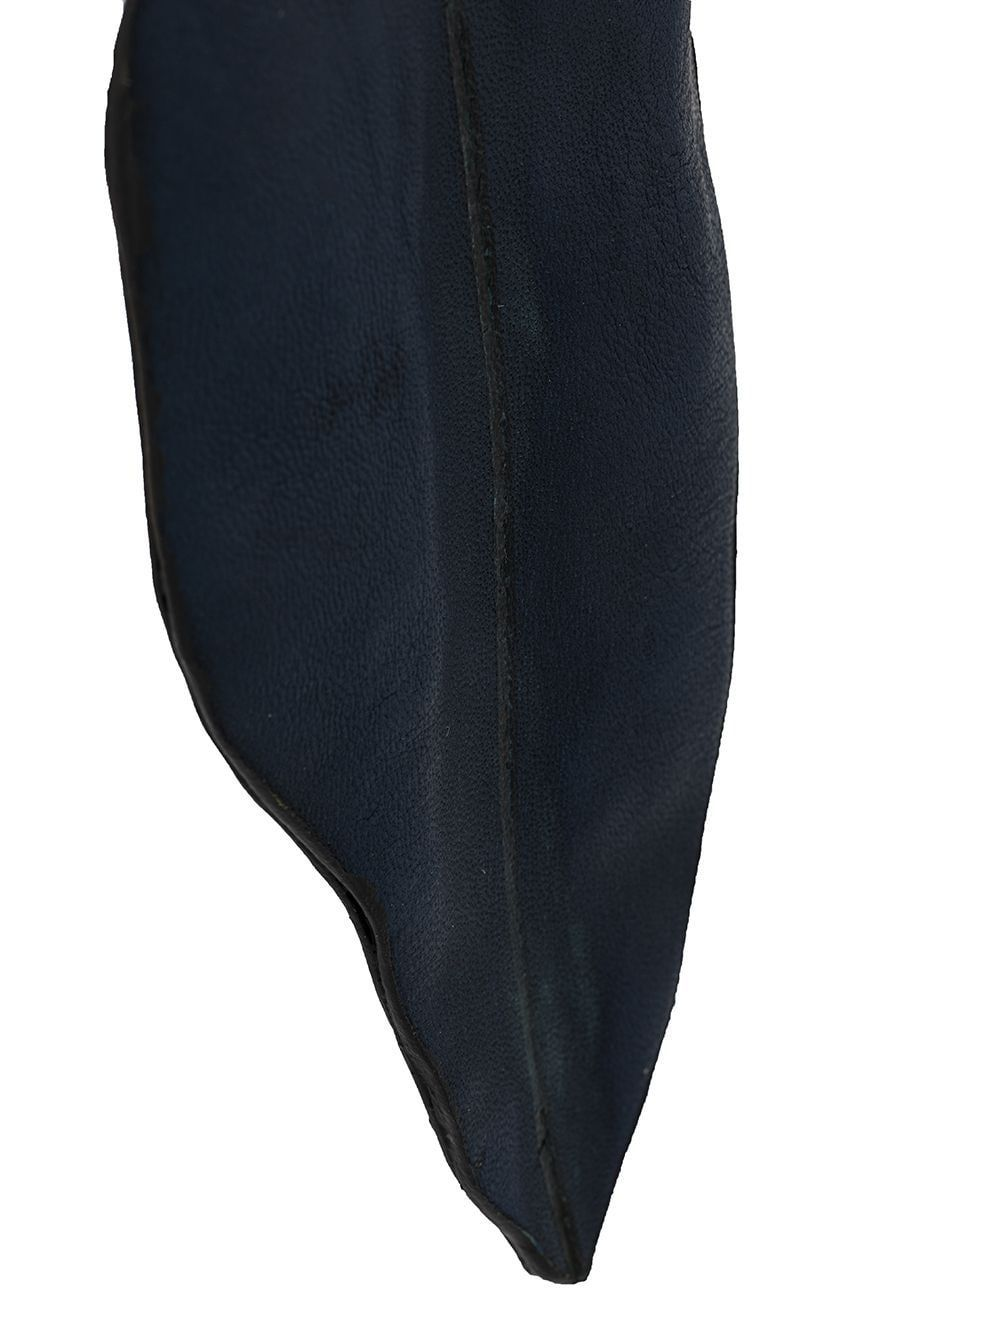 MARNI WOMEN'S COMV0088N0P300000B85 BLUE METAL NECKLACE